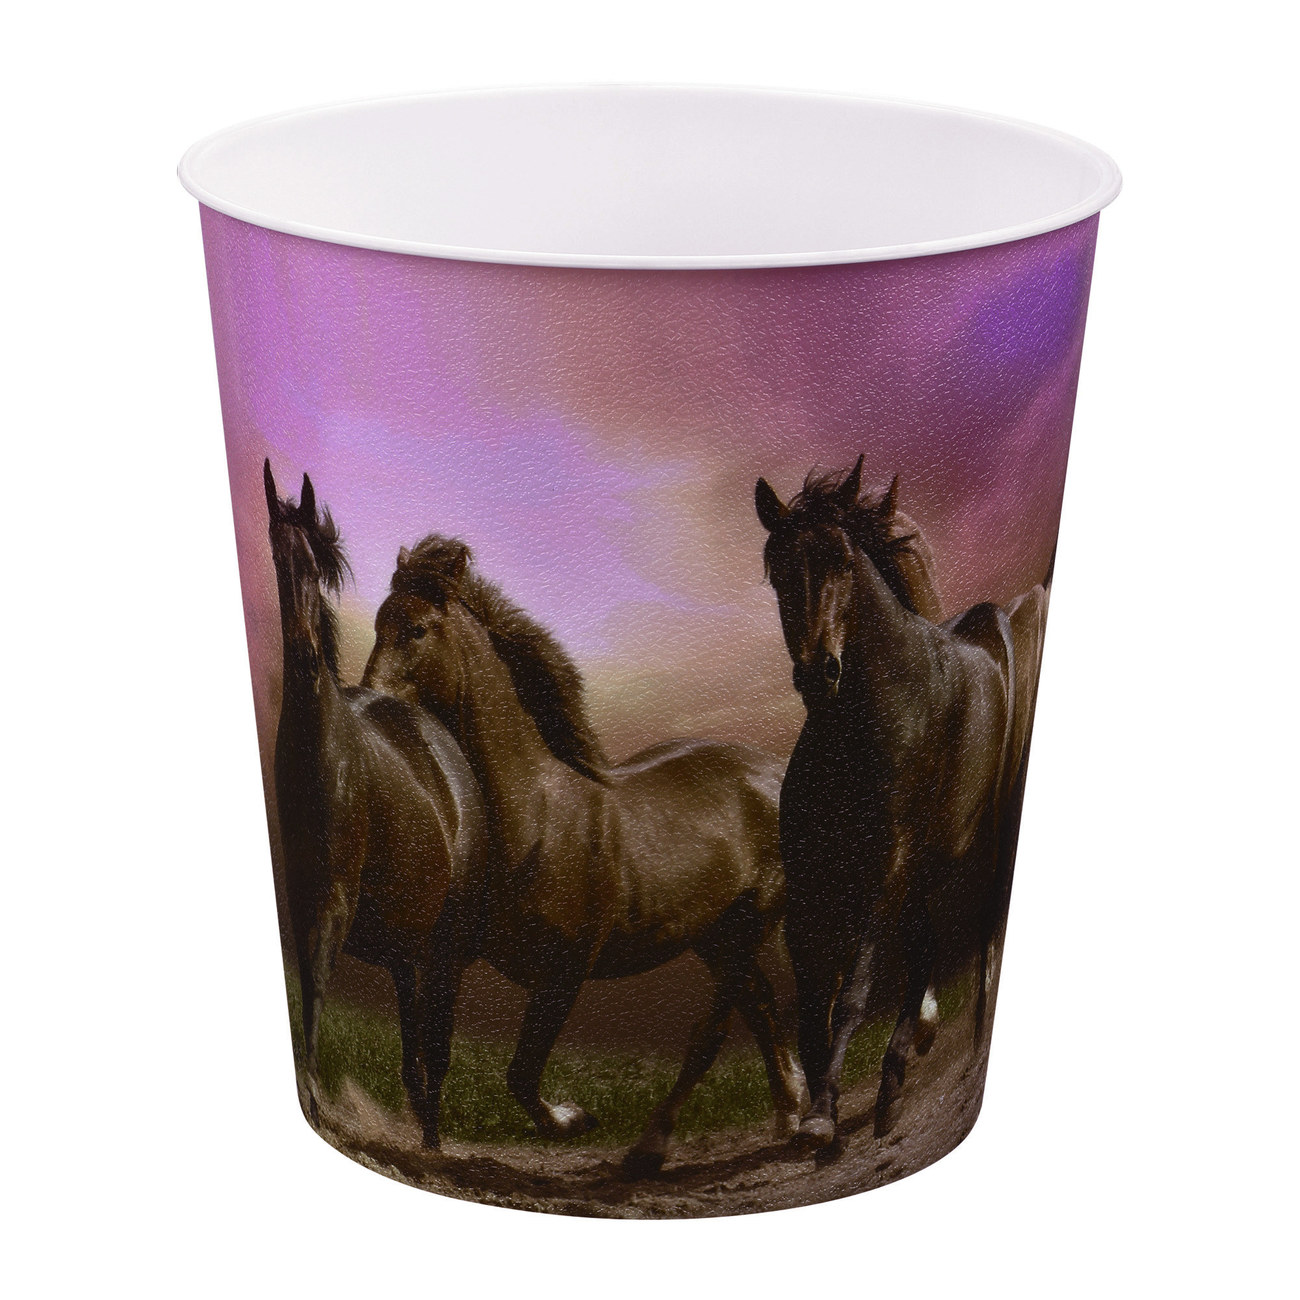 Idena Markenshop | Papierkorb, Pferde Motiv, 9 Liter, Kunststoff ...